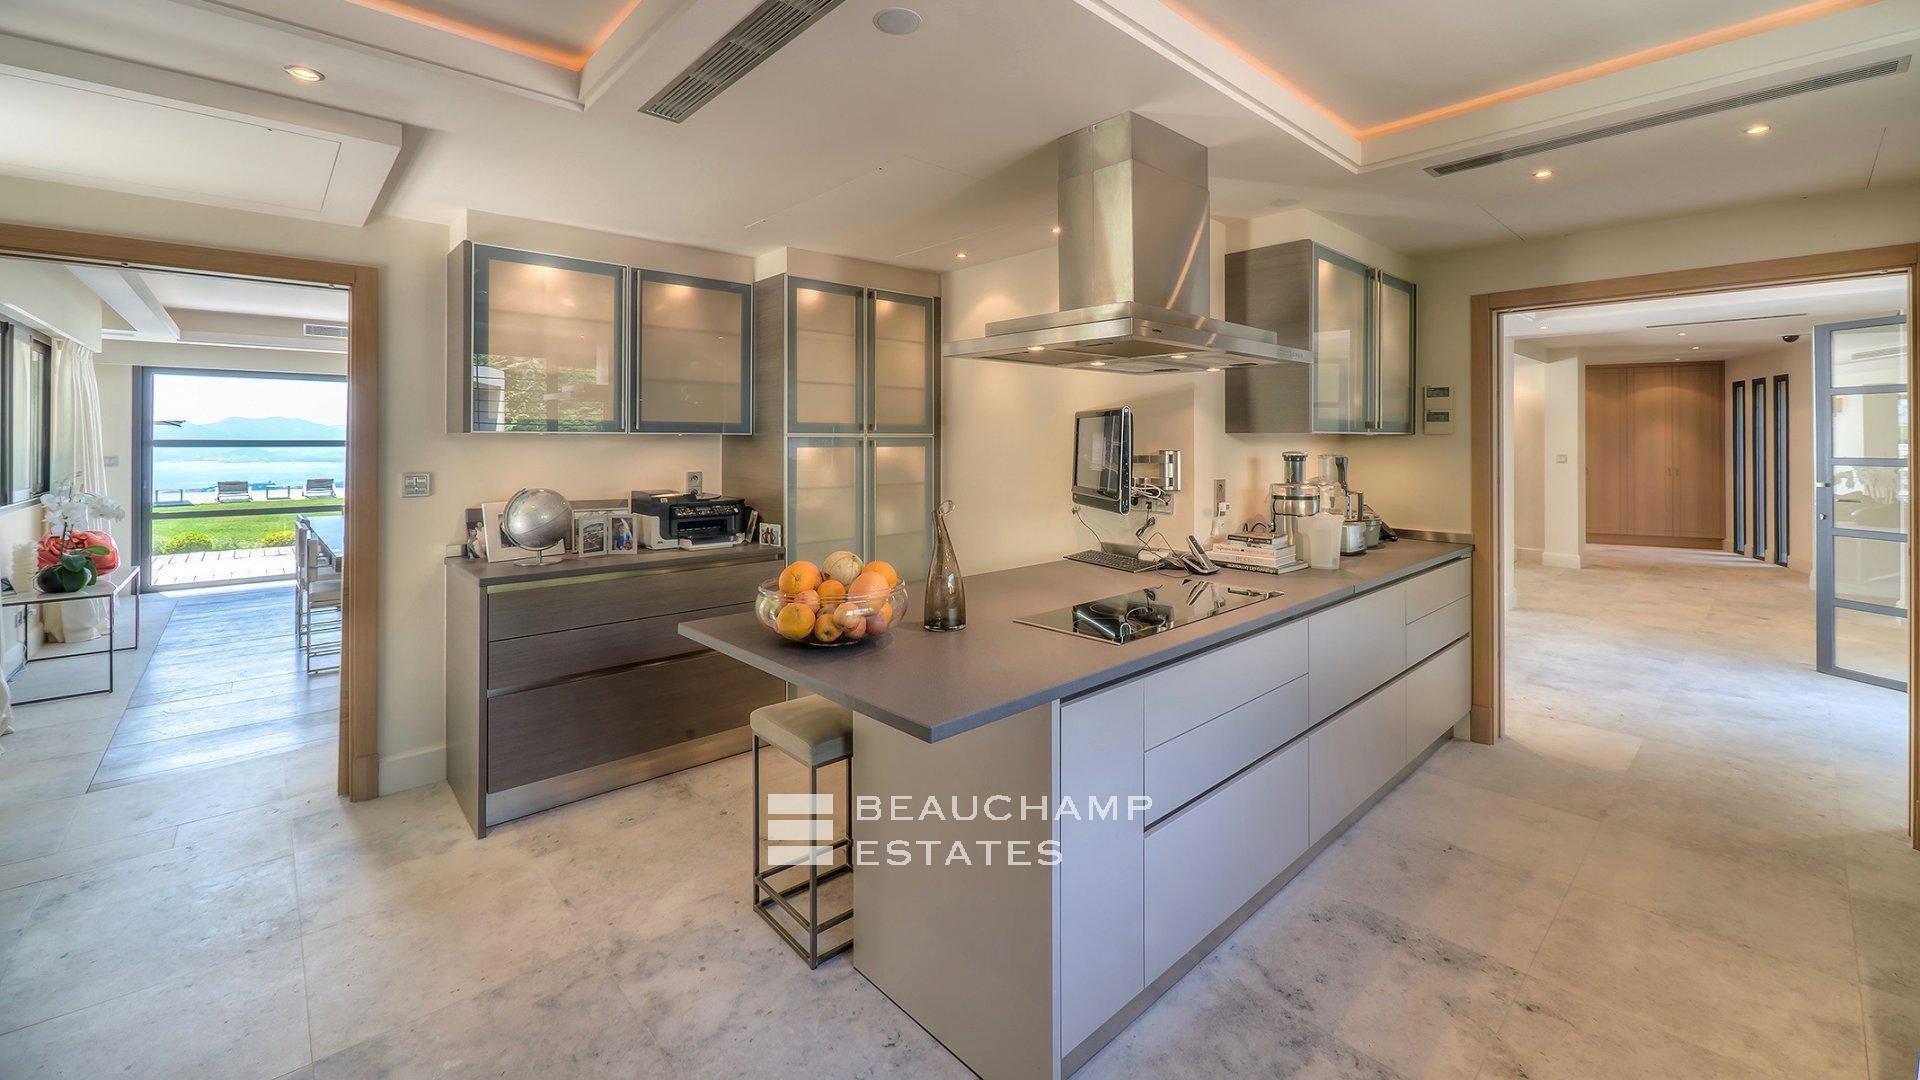 Stainless steel, natural light, kitchen island